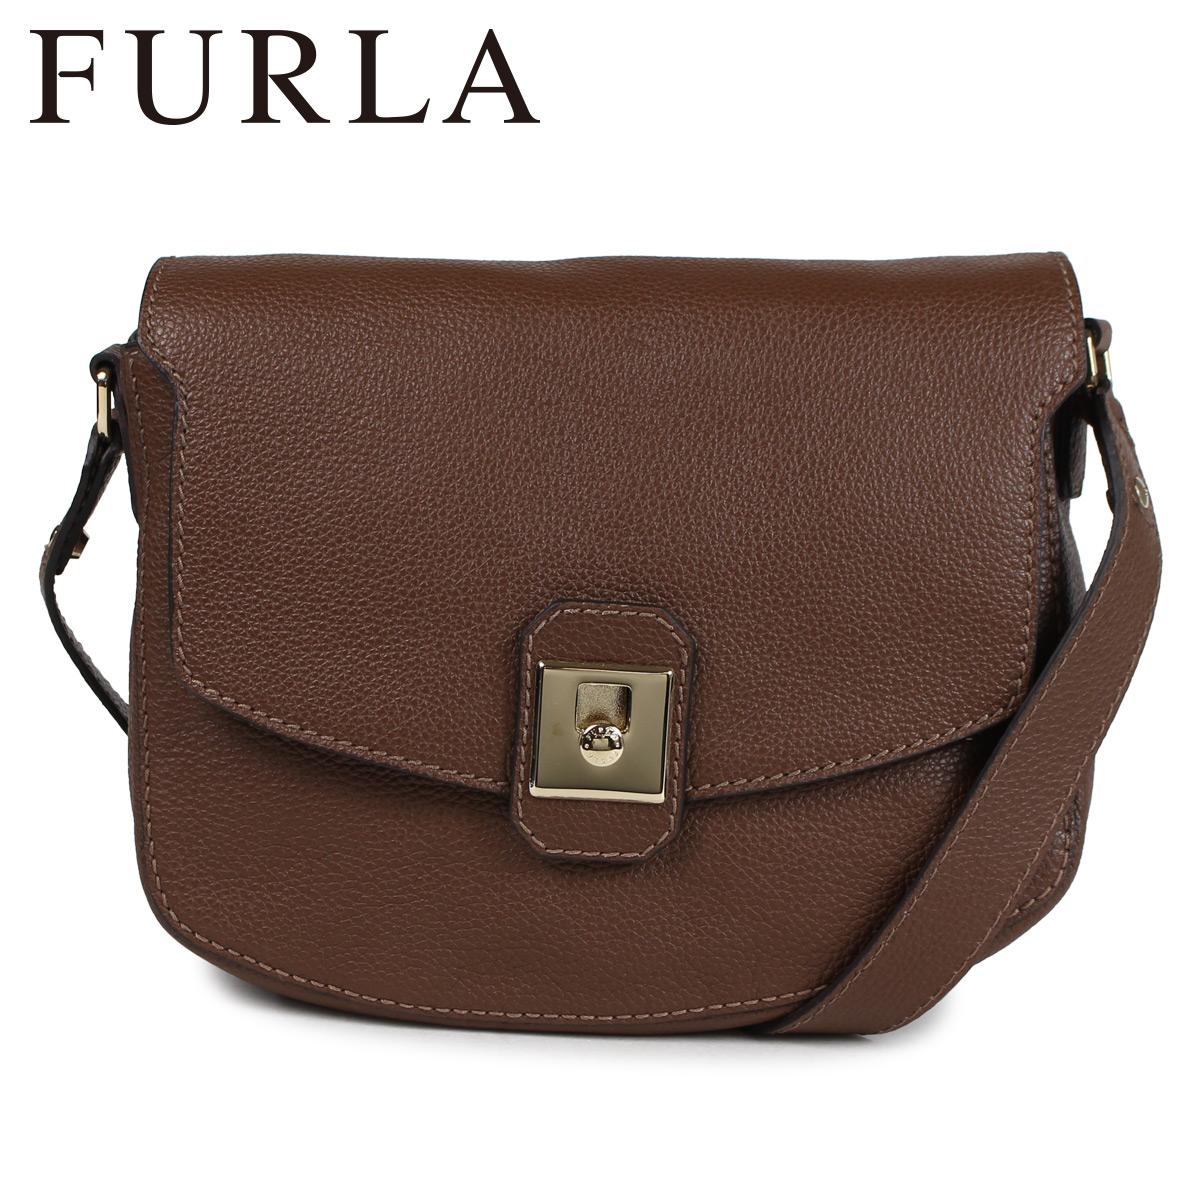 FURLA フルラ バッグ ショルダーバッグ レディース JO MINI SHOULDER BAG ブラウン 890822